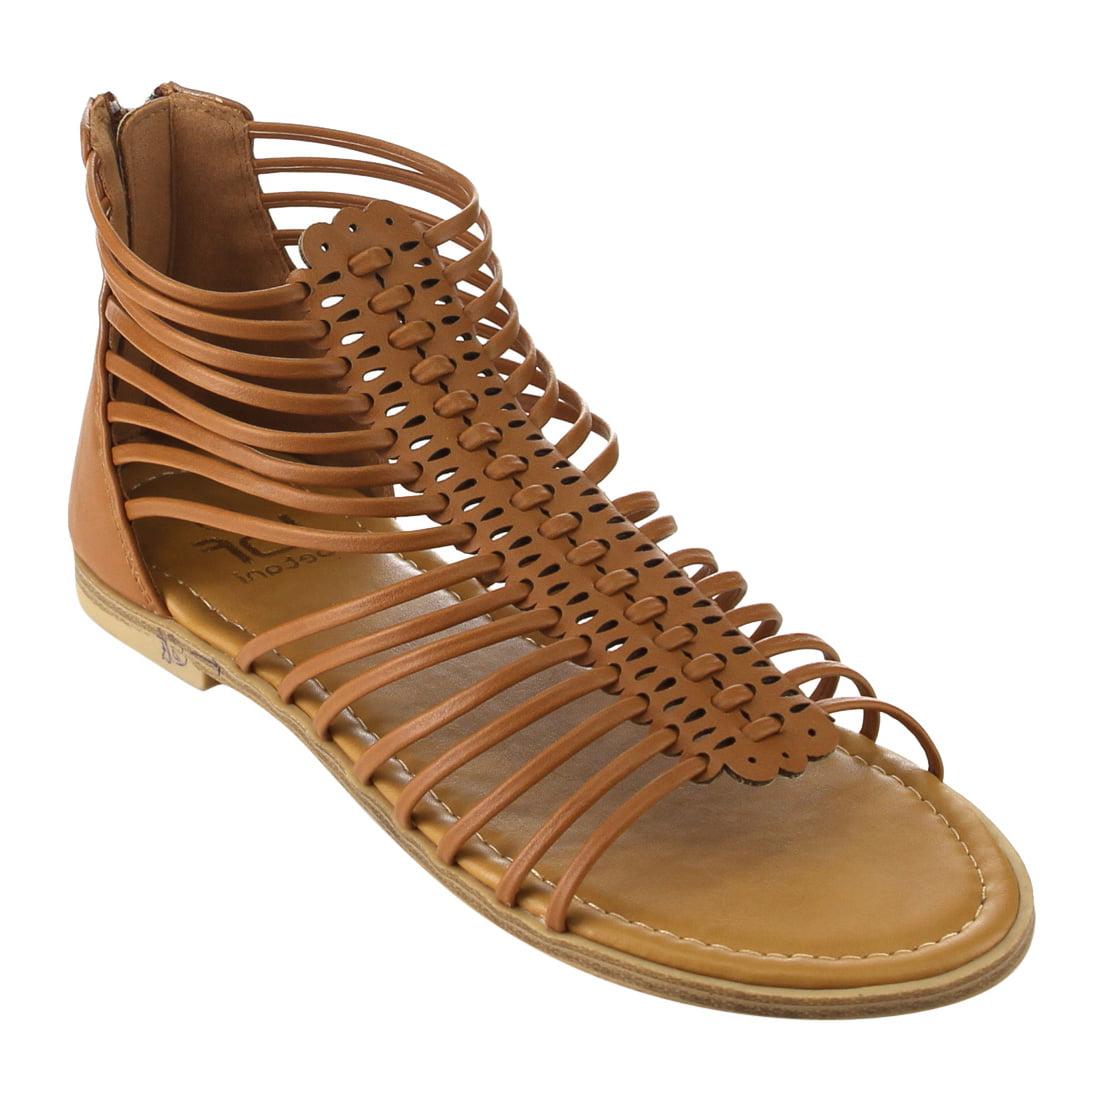 Womens sandals walmart - Betani Fh64 Women S Strappy Gladiator Summer Back Zip Flat Sandals Walmart Com